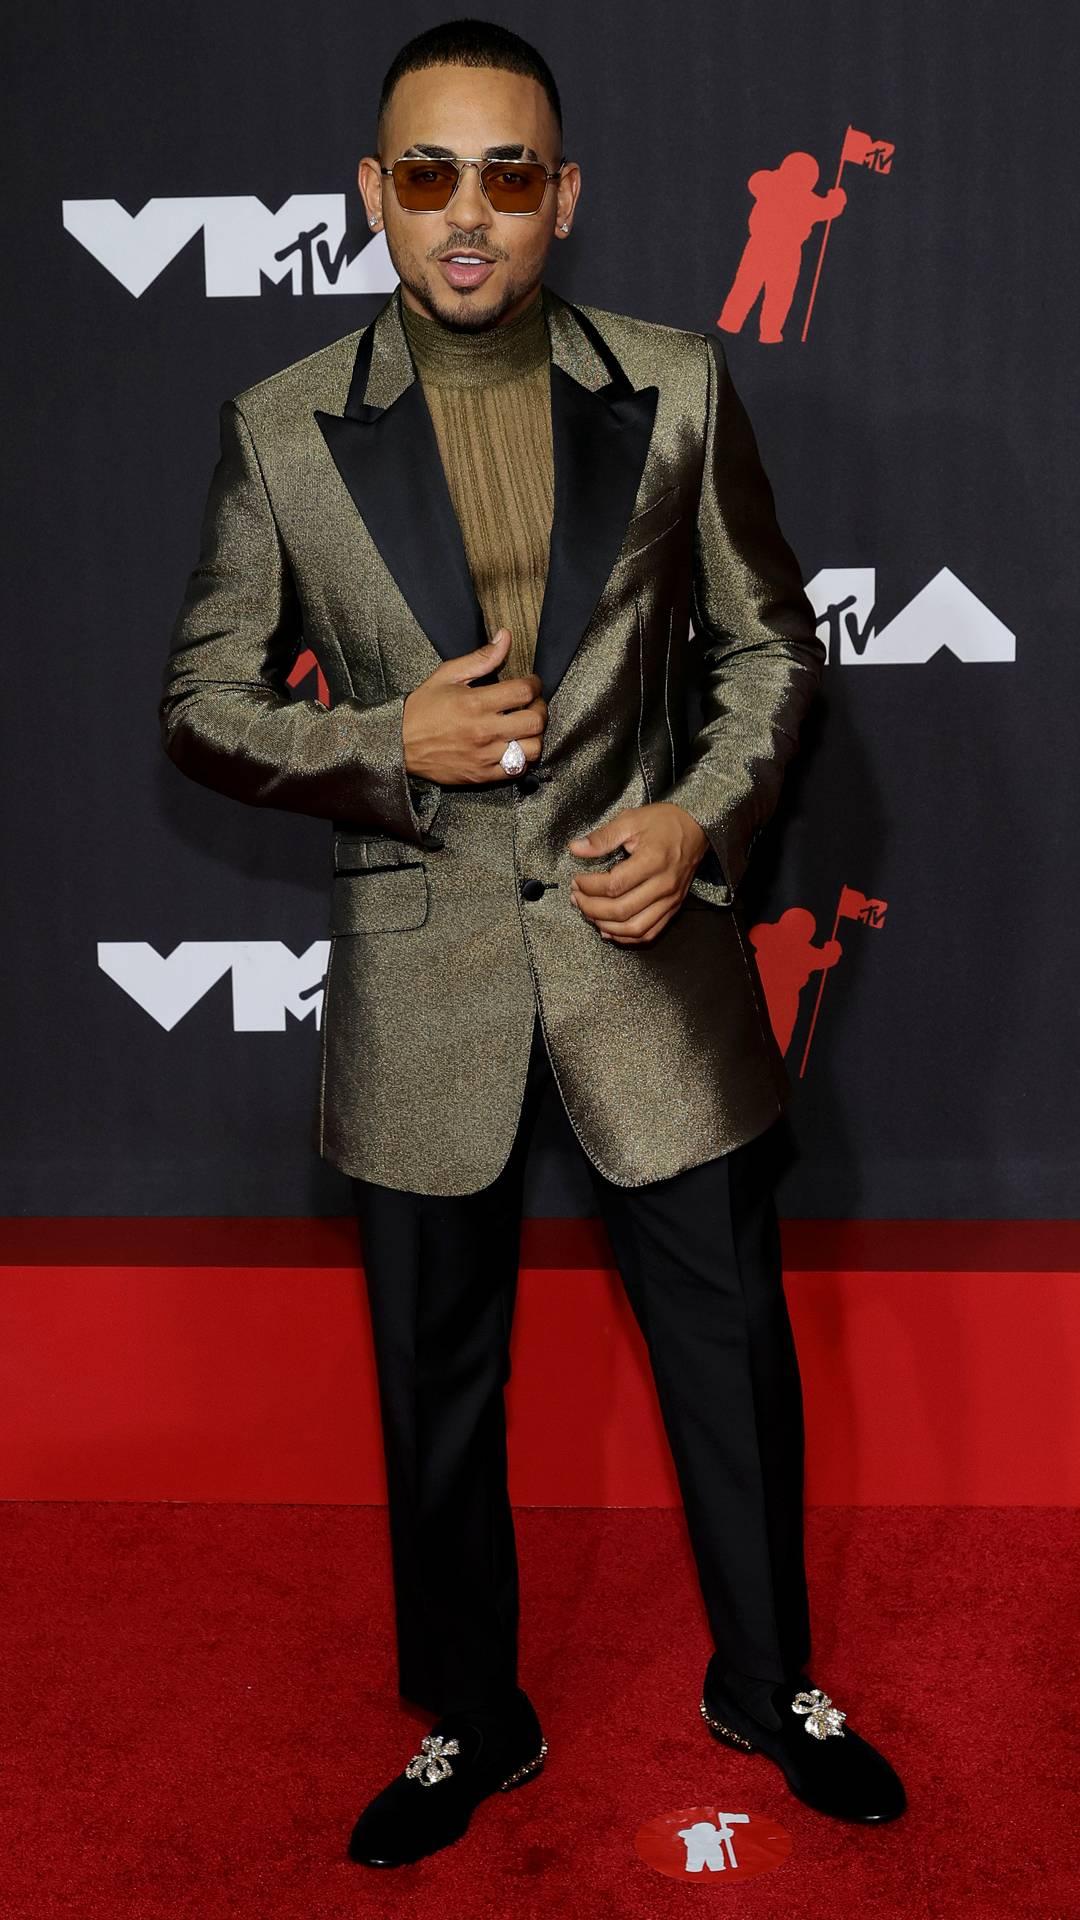 MTV Video Music Awards 2021 | The Best of the VMAs 2021 Red Carpet | Ozuna | 1080x1920